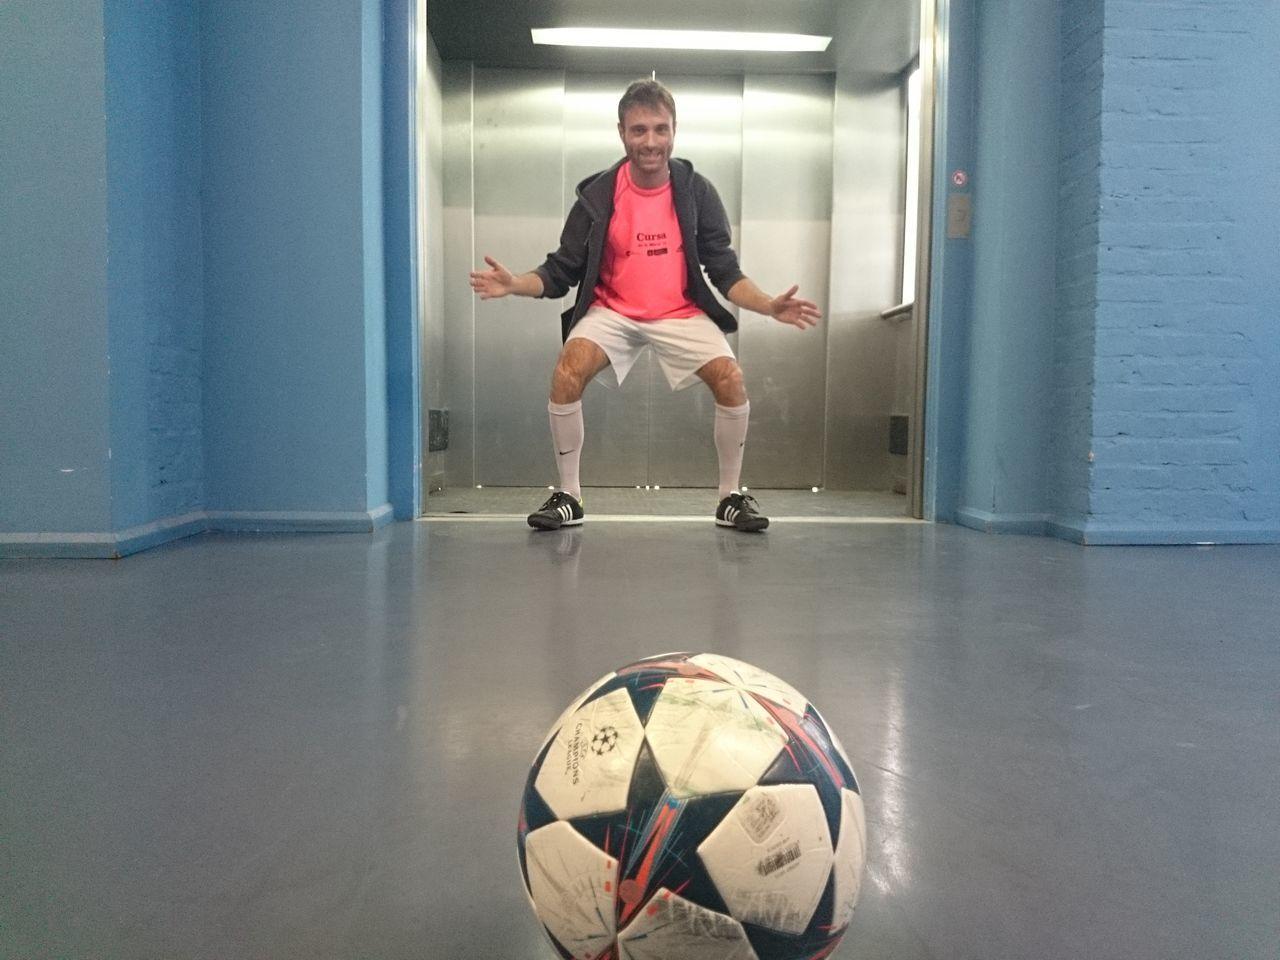 Beautiful stock photos of soccer balls, Ball, Casual Clothing, Caucasian Ethnicity, Corridor